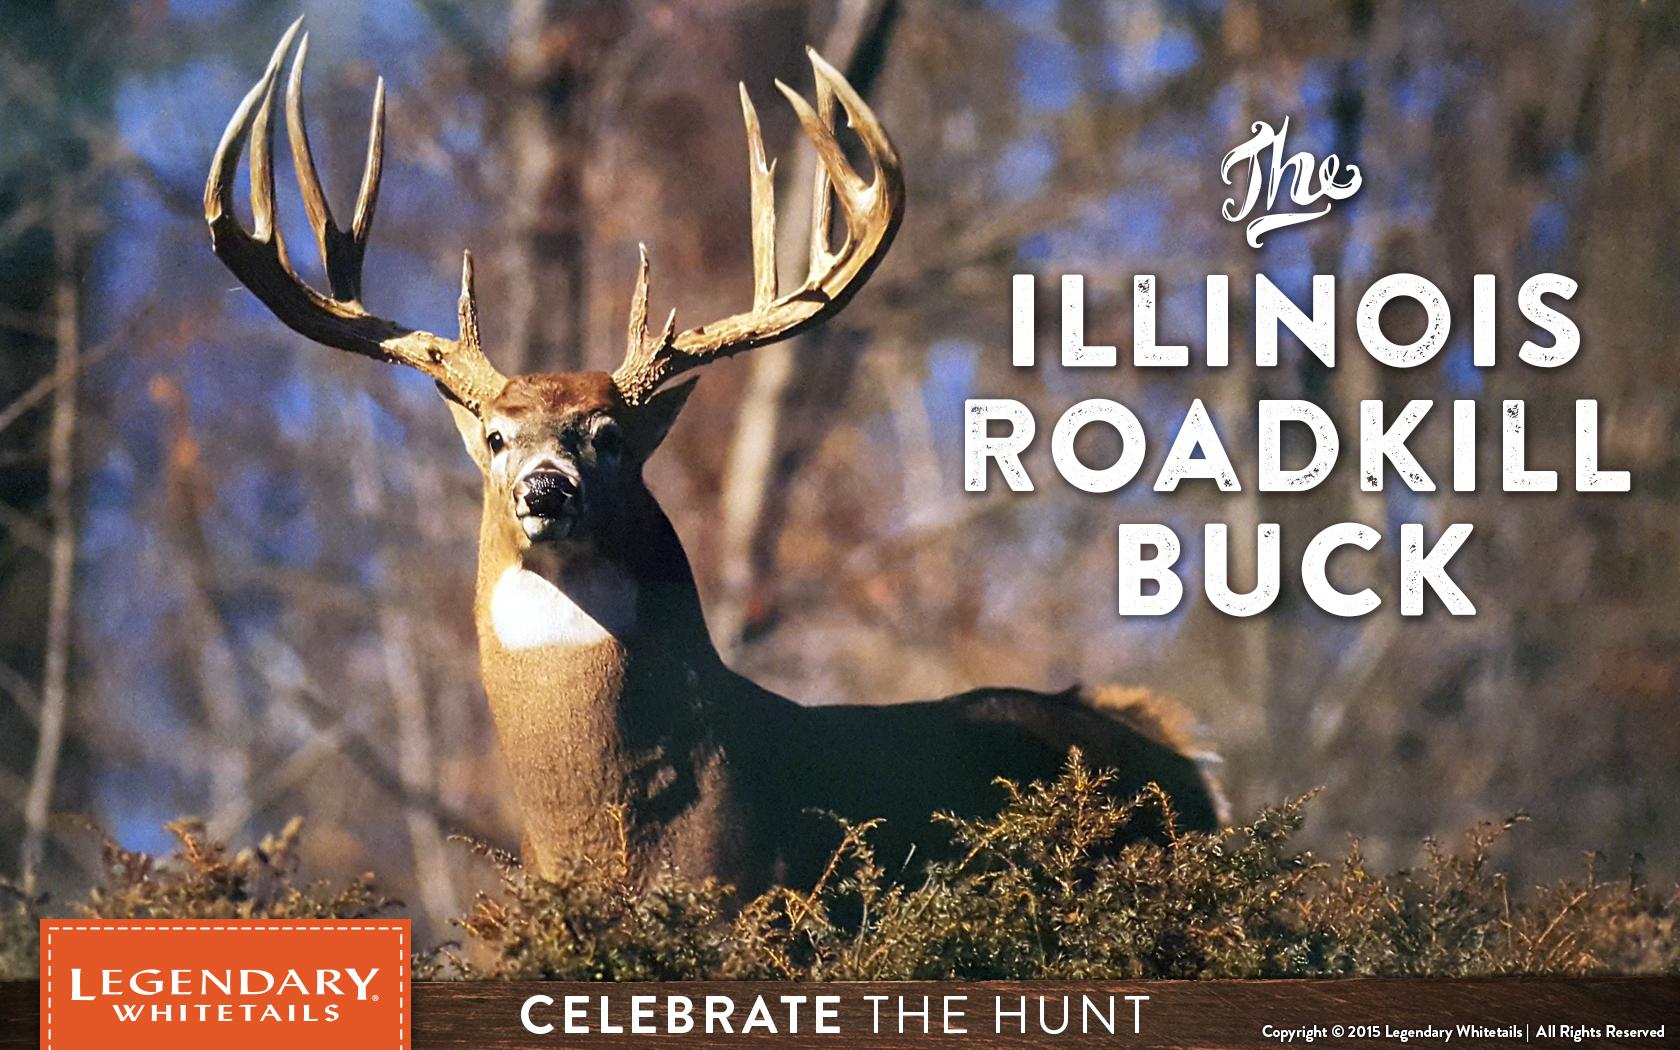 Illinois Road Kill Buck - Legendary Whitetail's Blog with Illinois Deer Rut